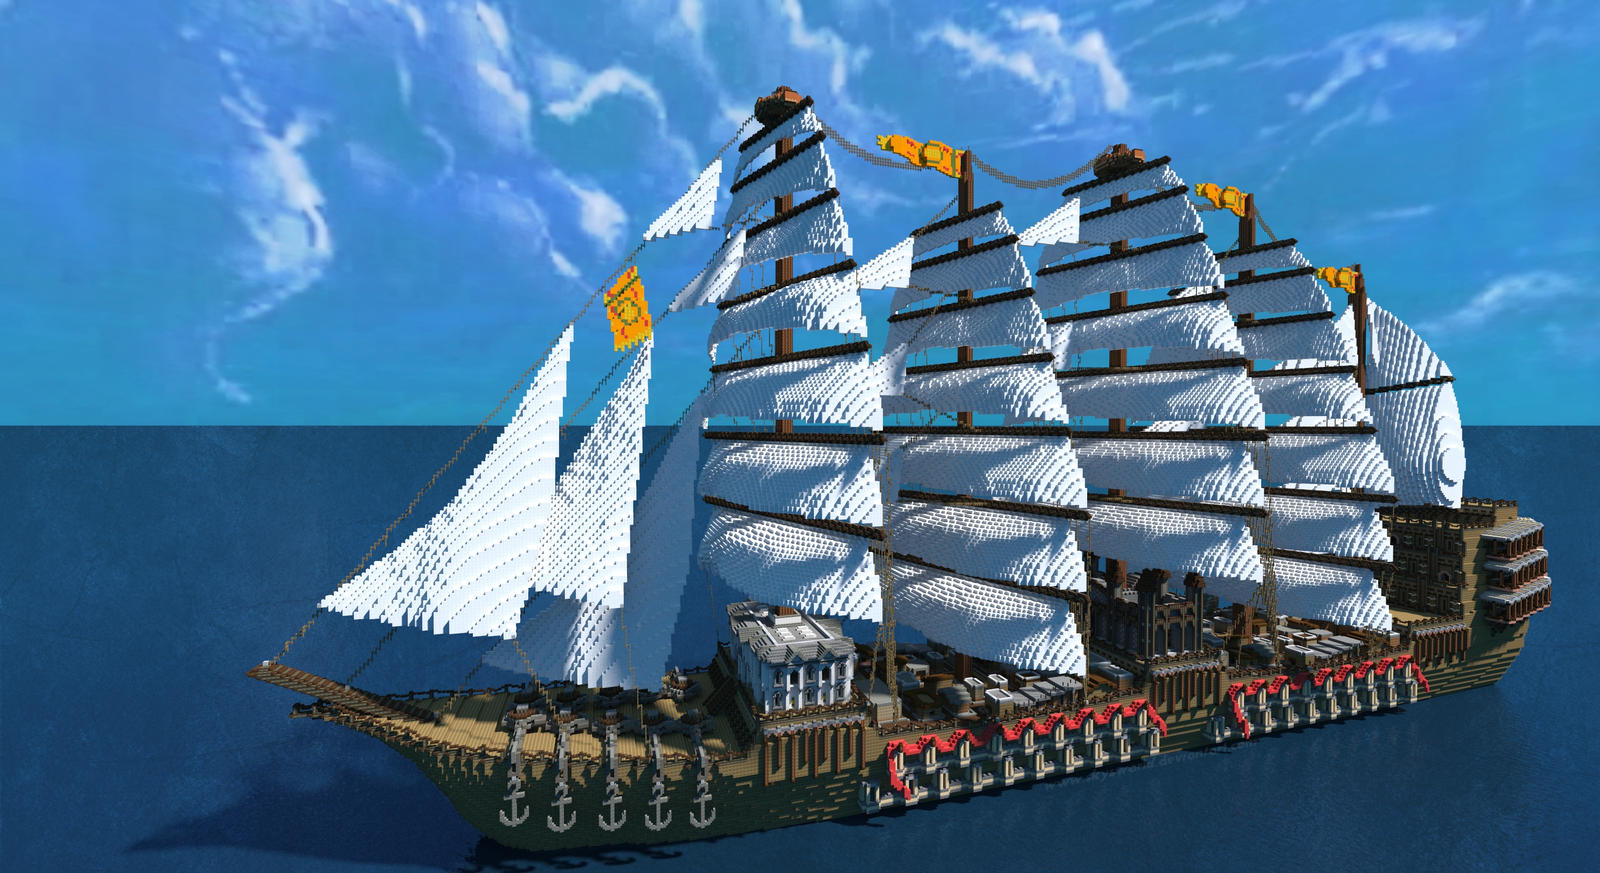 Minecraft Giant Ship By Skysworld On Deviantart